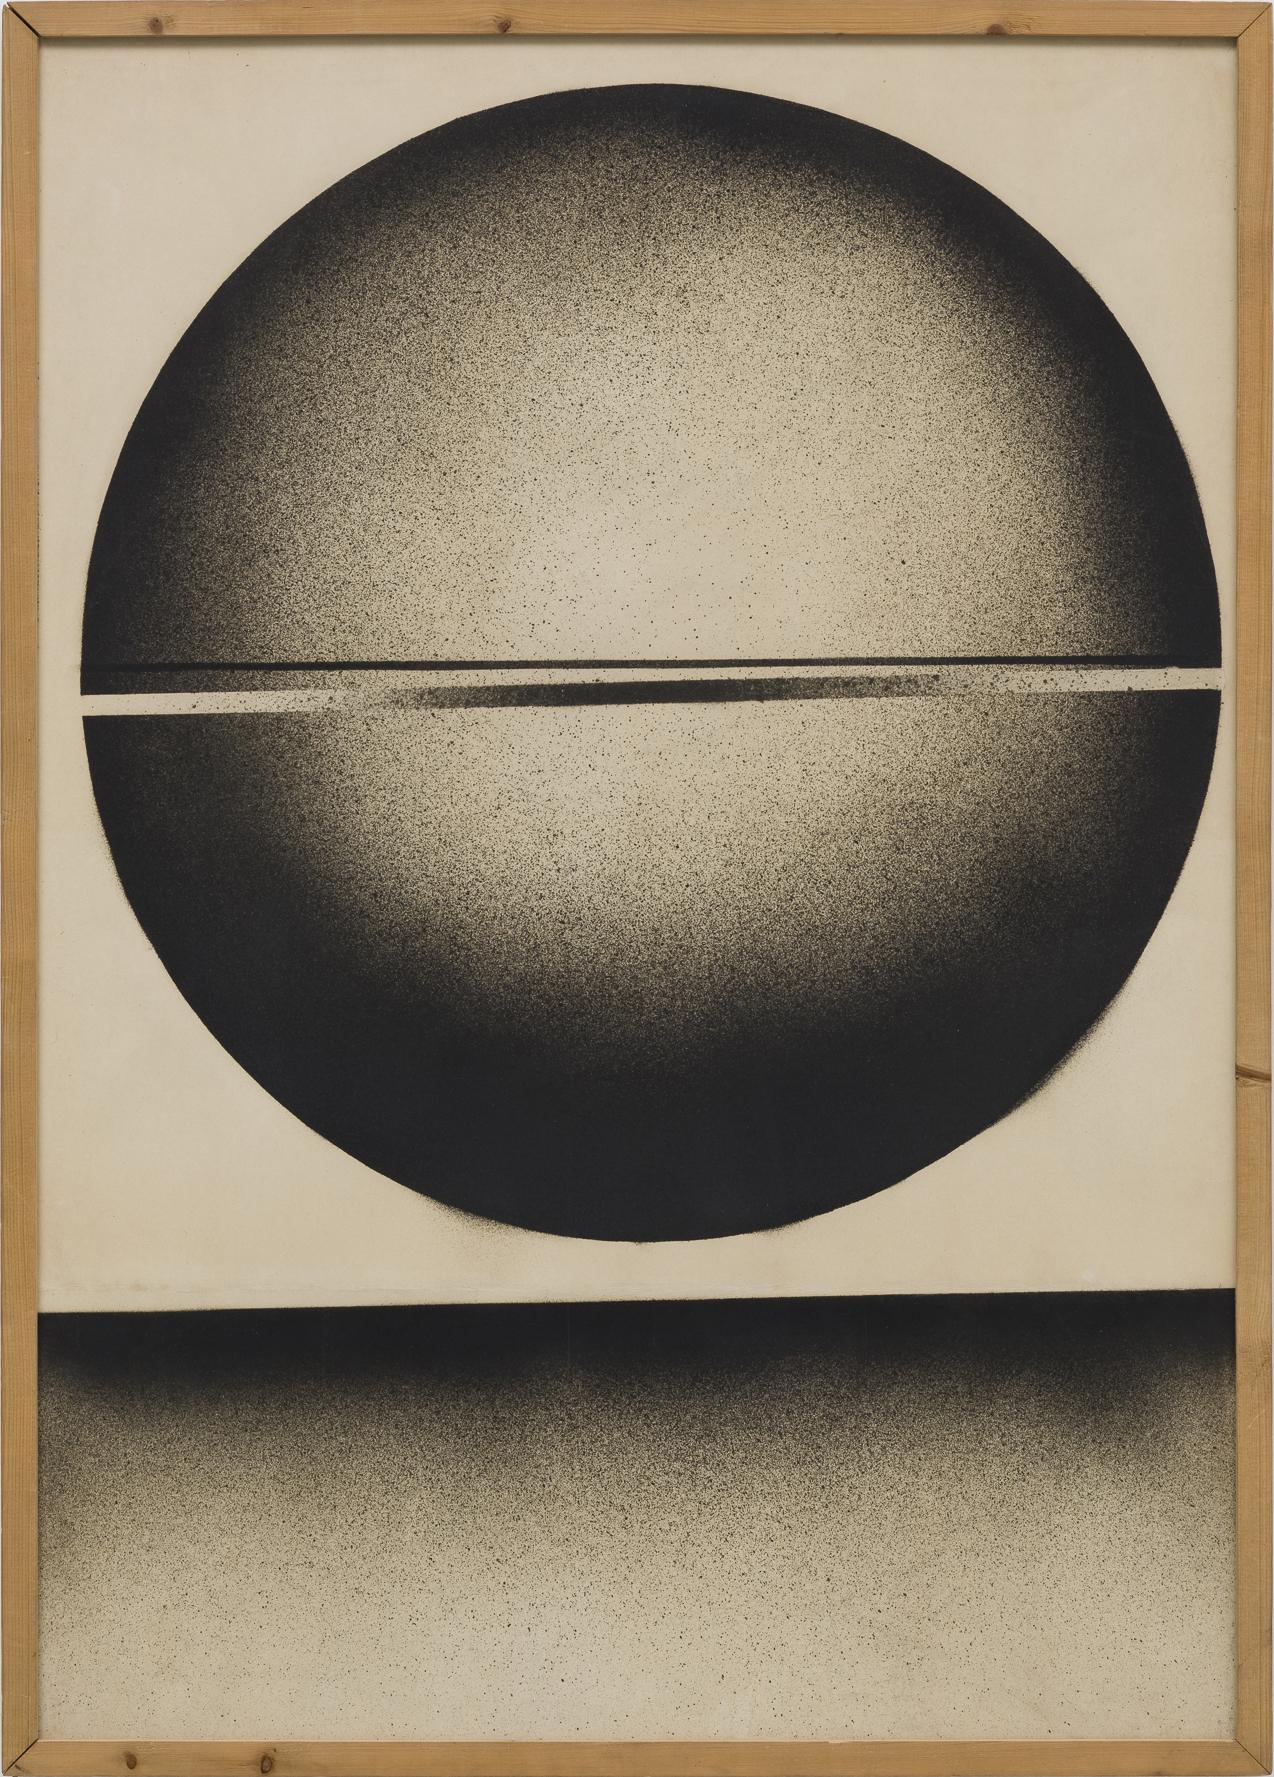 Ferenc Ficzek, Untitled (Sphere), 1969-1970, ink, printing ink, spray on paper, 98 x 70 cm. Photo: Marcus Schneider